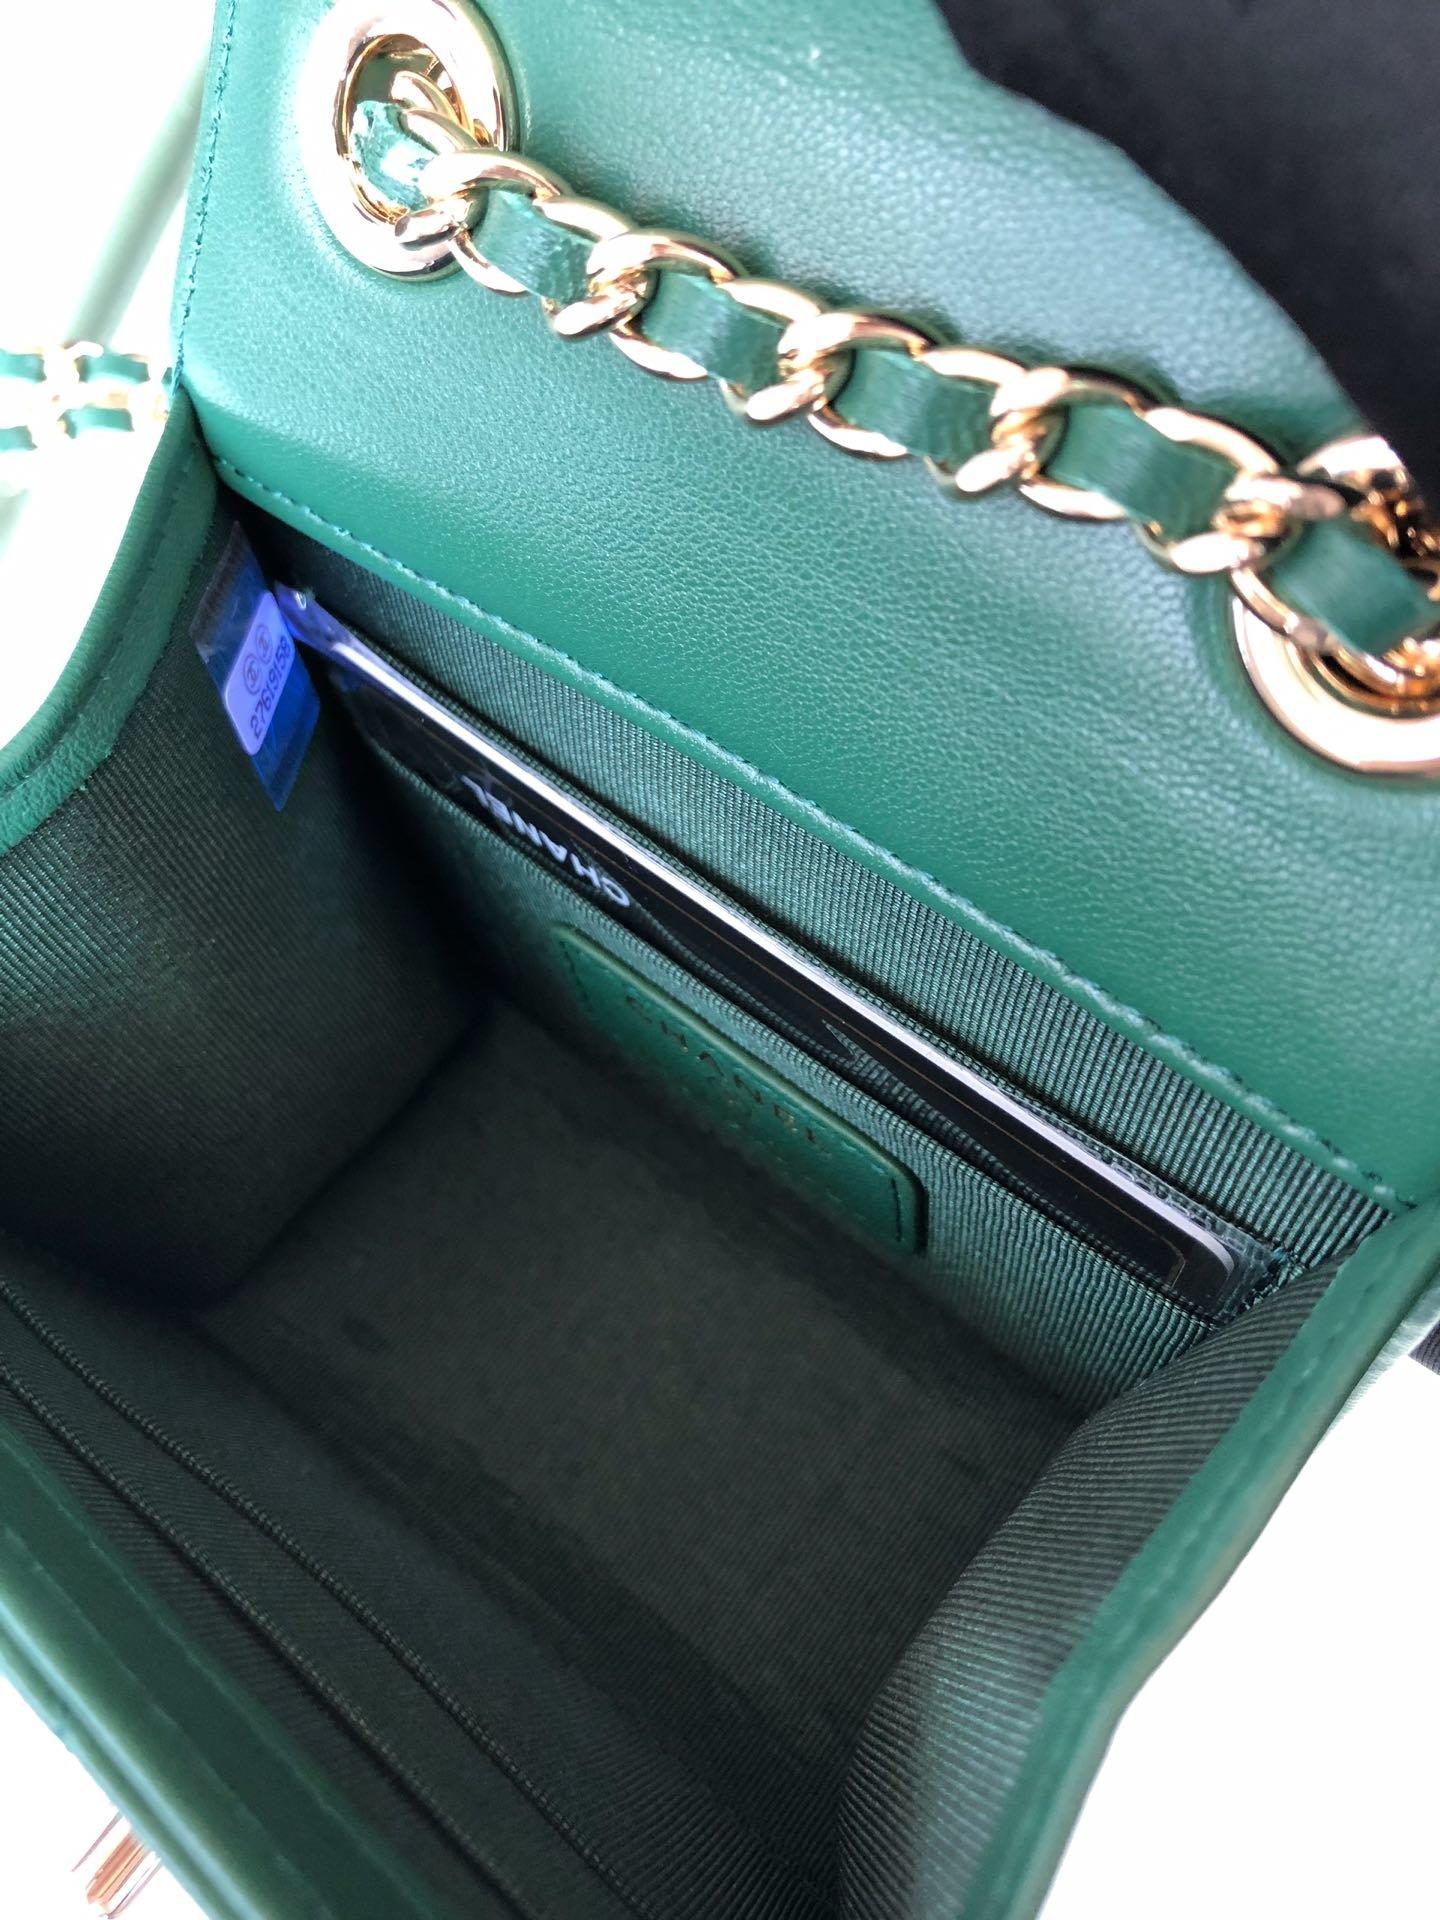 Chanel香奈儿专柜同款 大方格新款零钱包 单肩斜挎(图9)